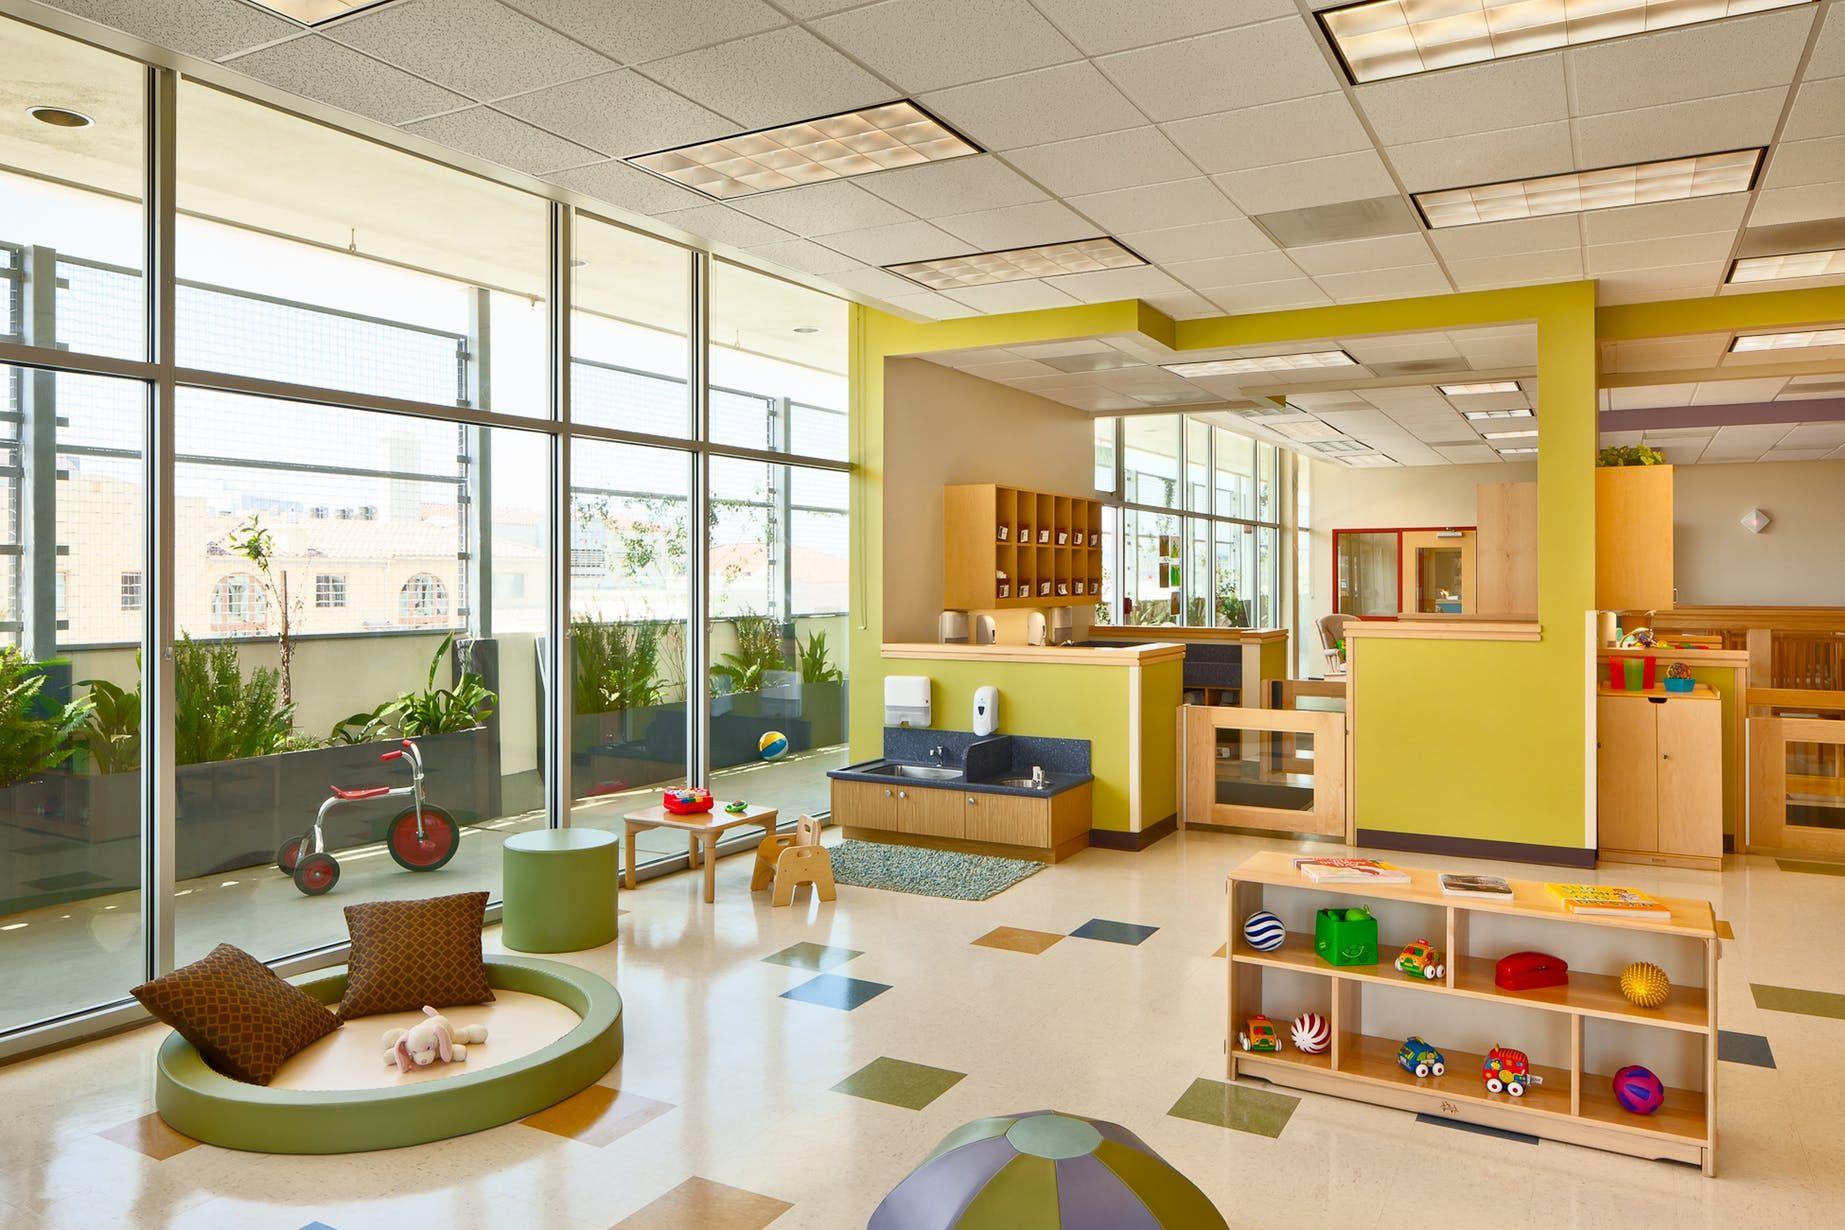 UCLA Childcare Center | Daycare design, Kindergarten ...